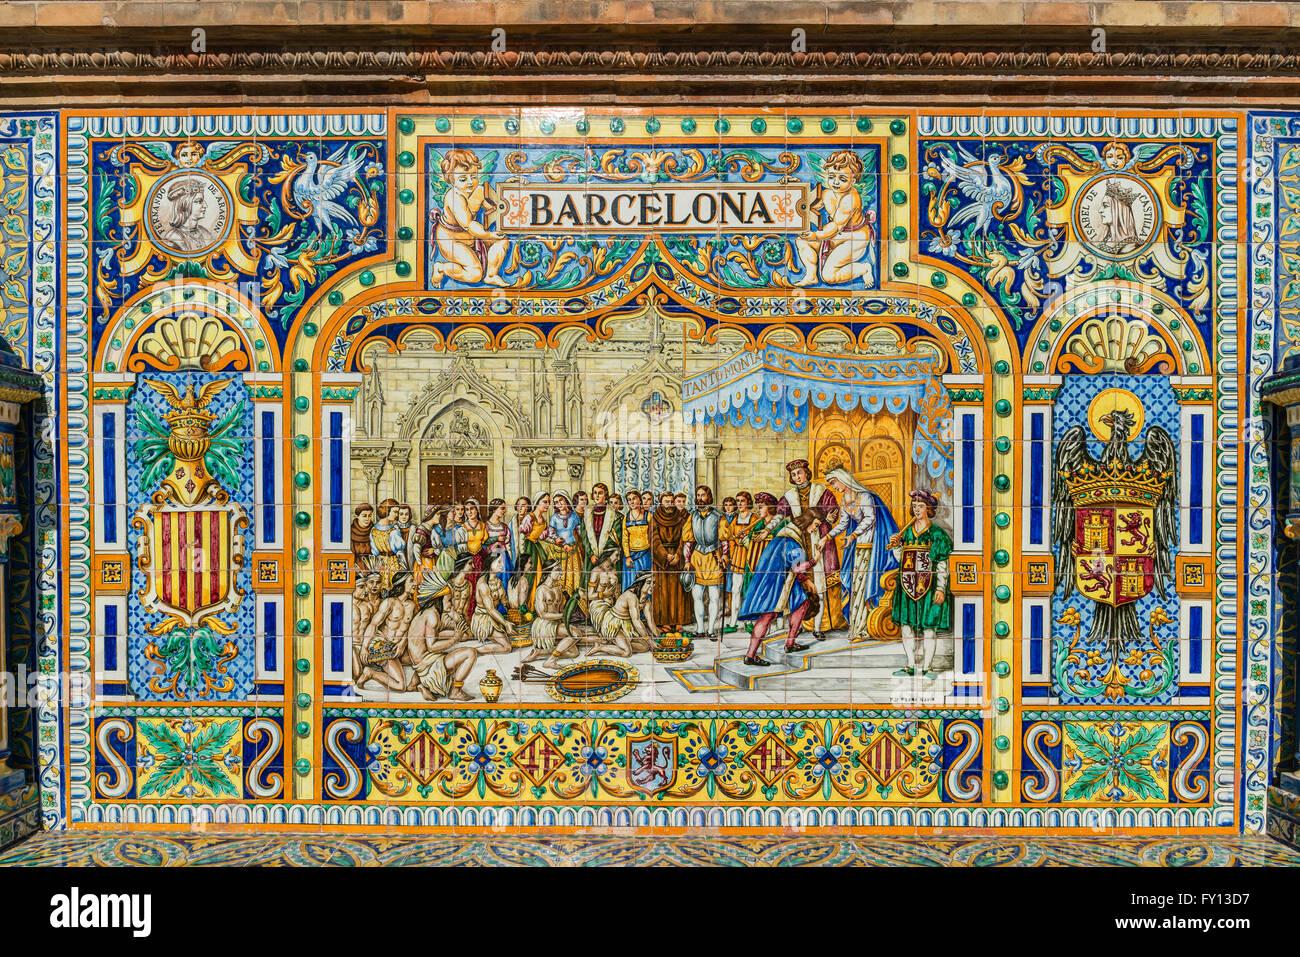 Antique ceramic, wall tiles representing provinces and cities of Spain , Barcelona , Placa de Espana, spanish square, - Stock Image